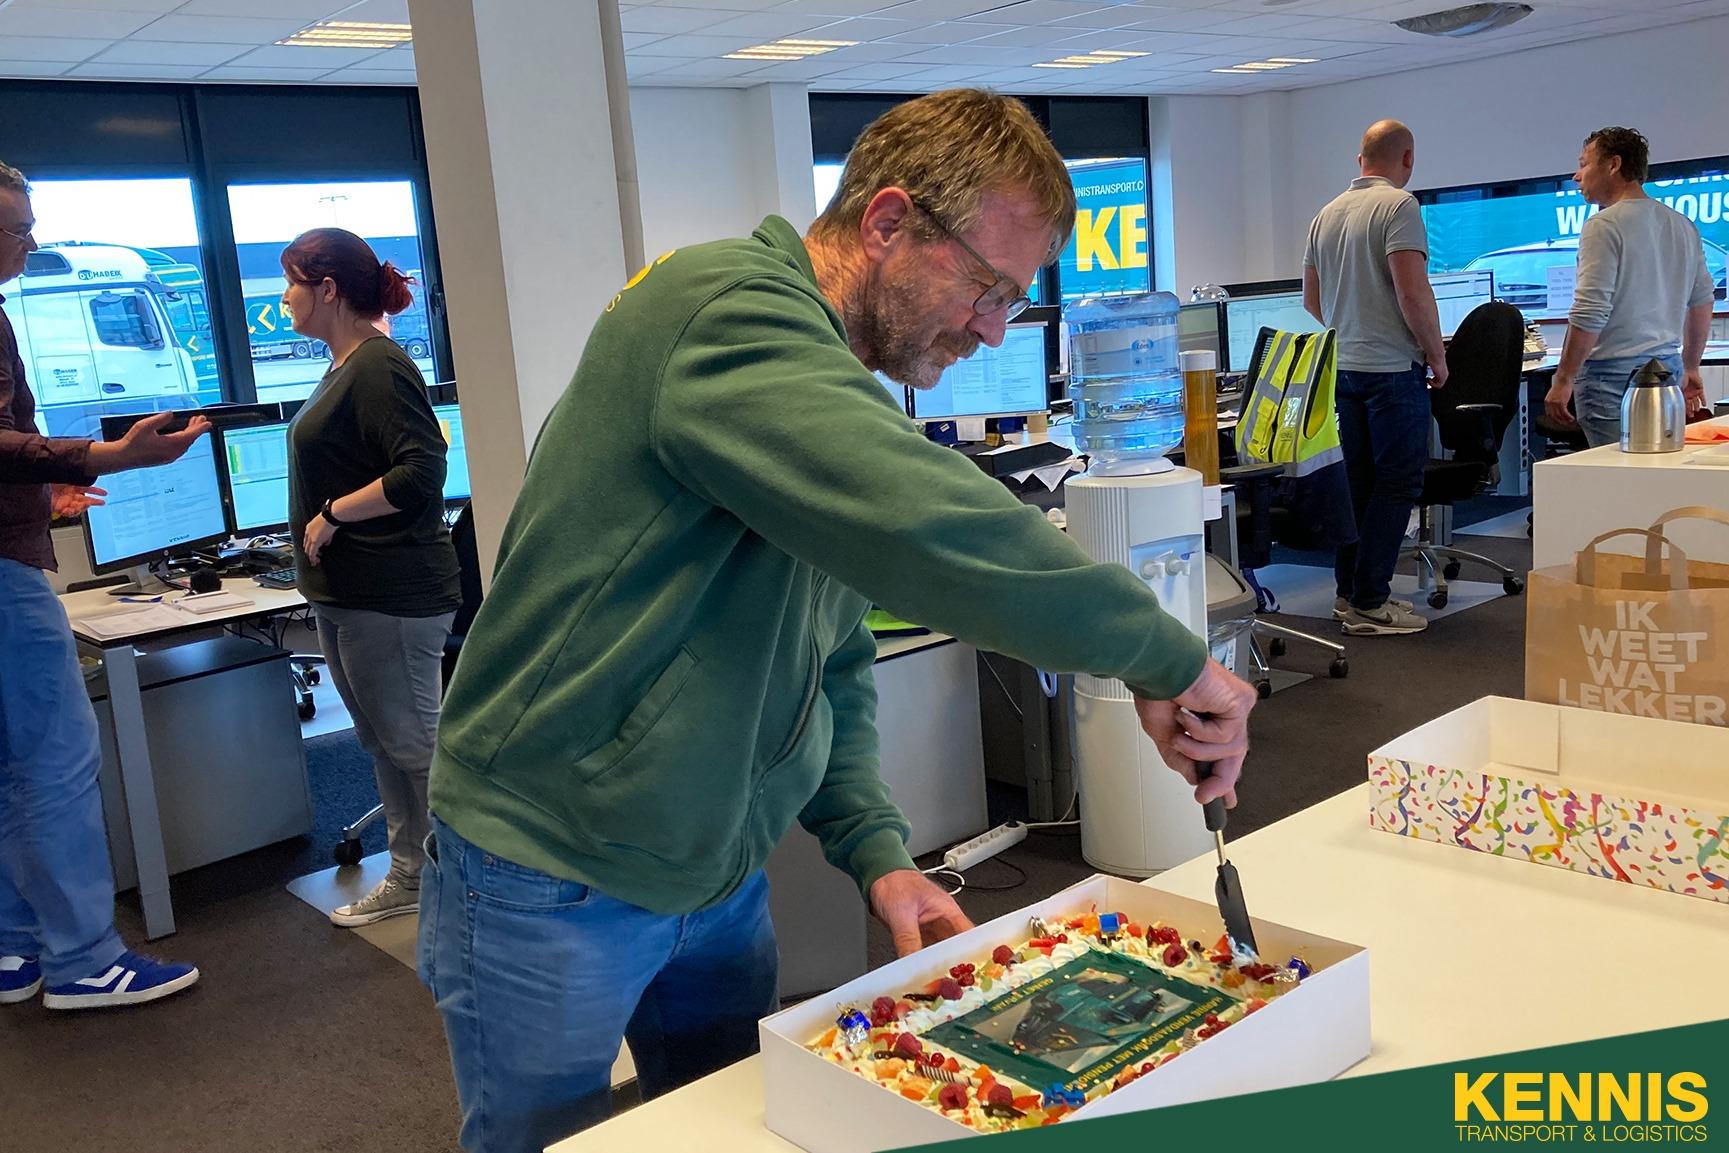 Vandaag-gaat-onze-top-chauffeur-Harrie-Verdaasdonk-met-pensioen-na-34-jaar--16-1-2020---(2)